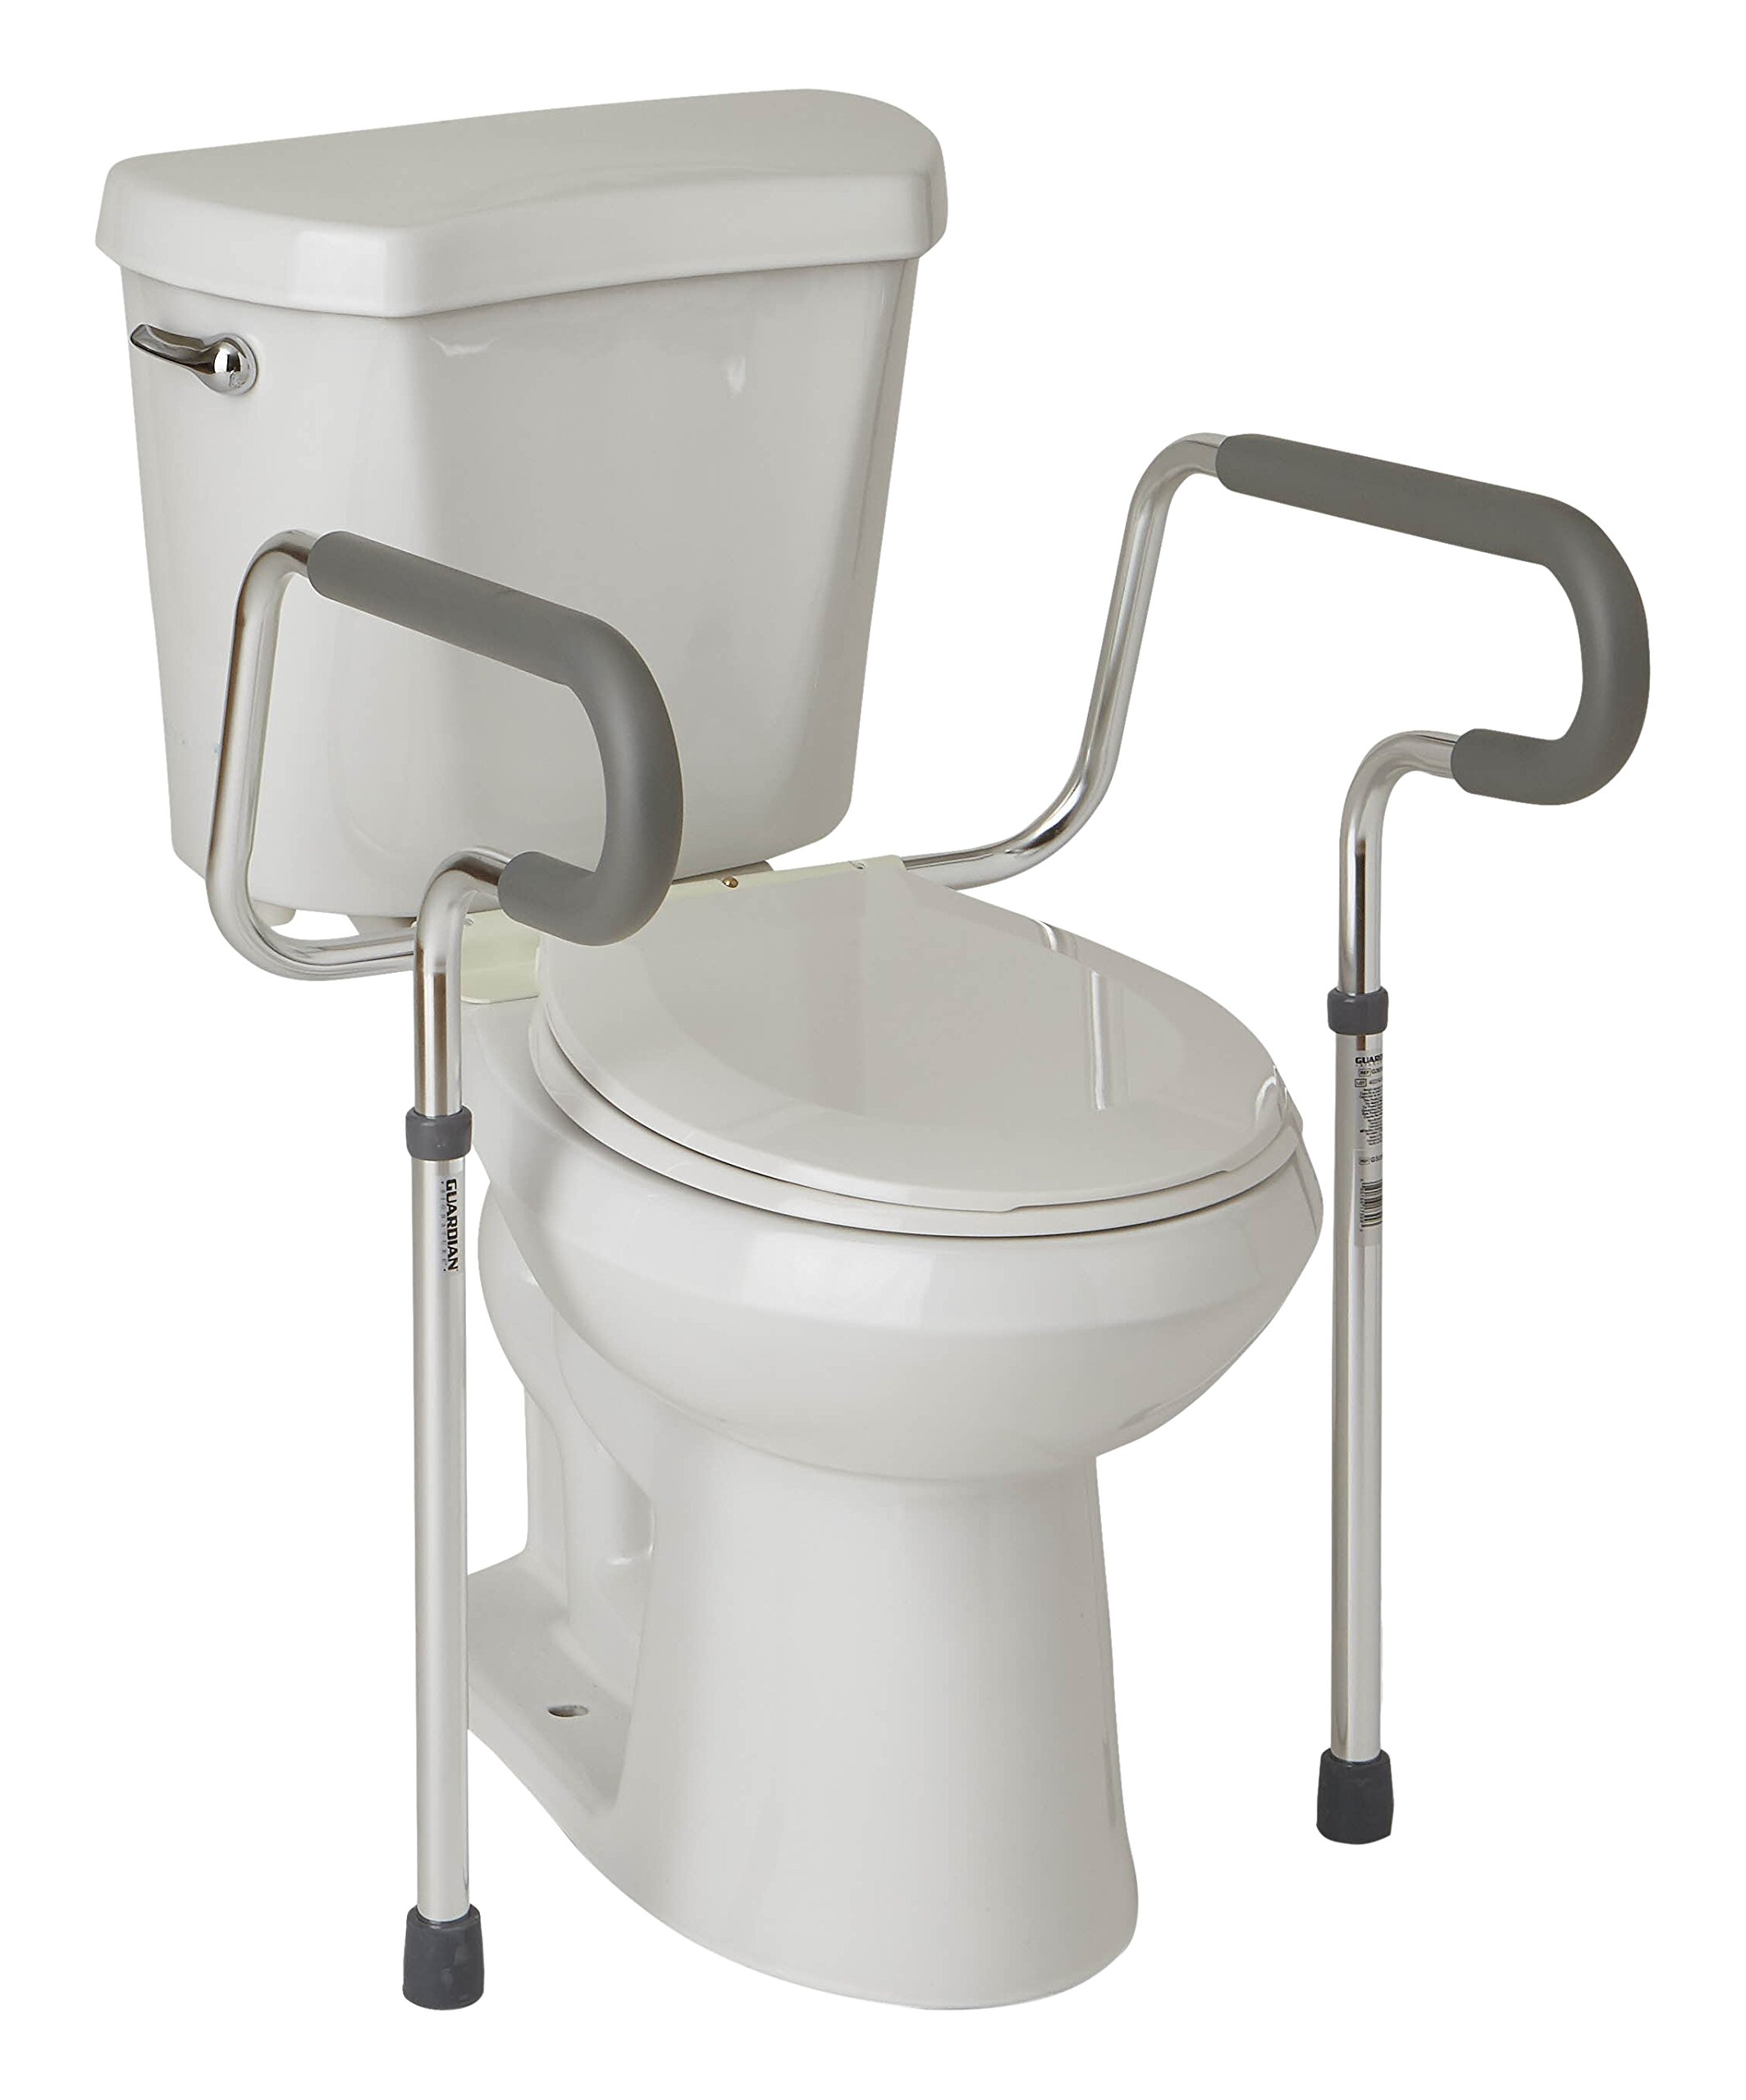 Medlines Guardian Toilet Adjustable Bathroom